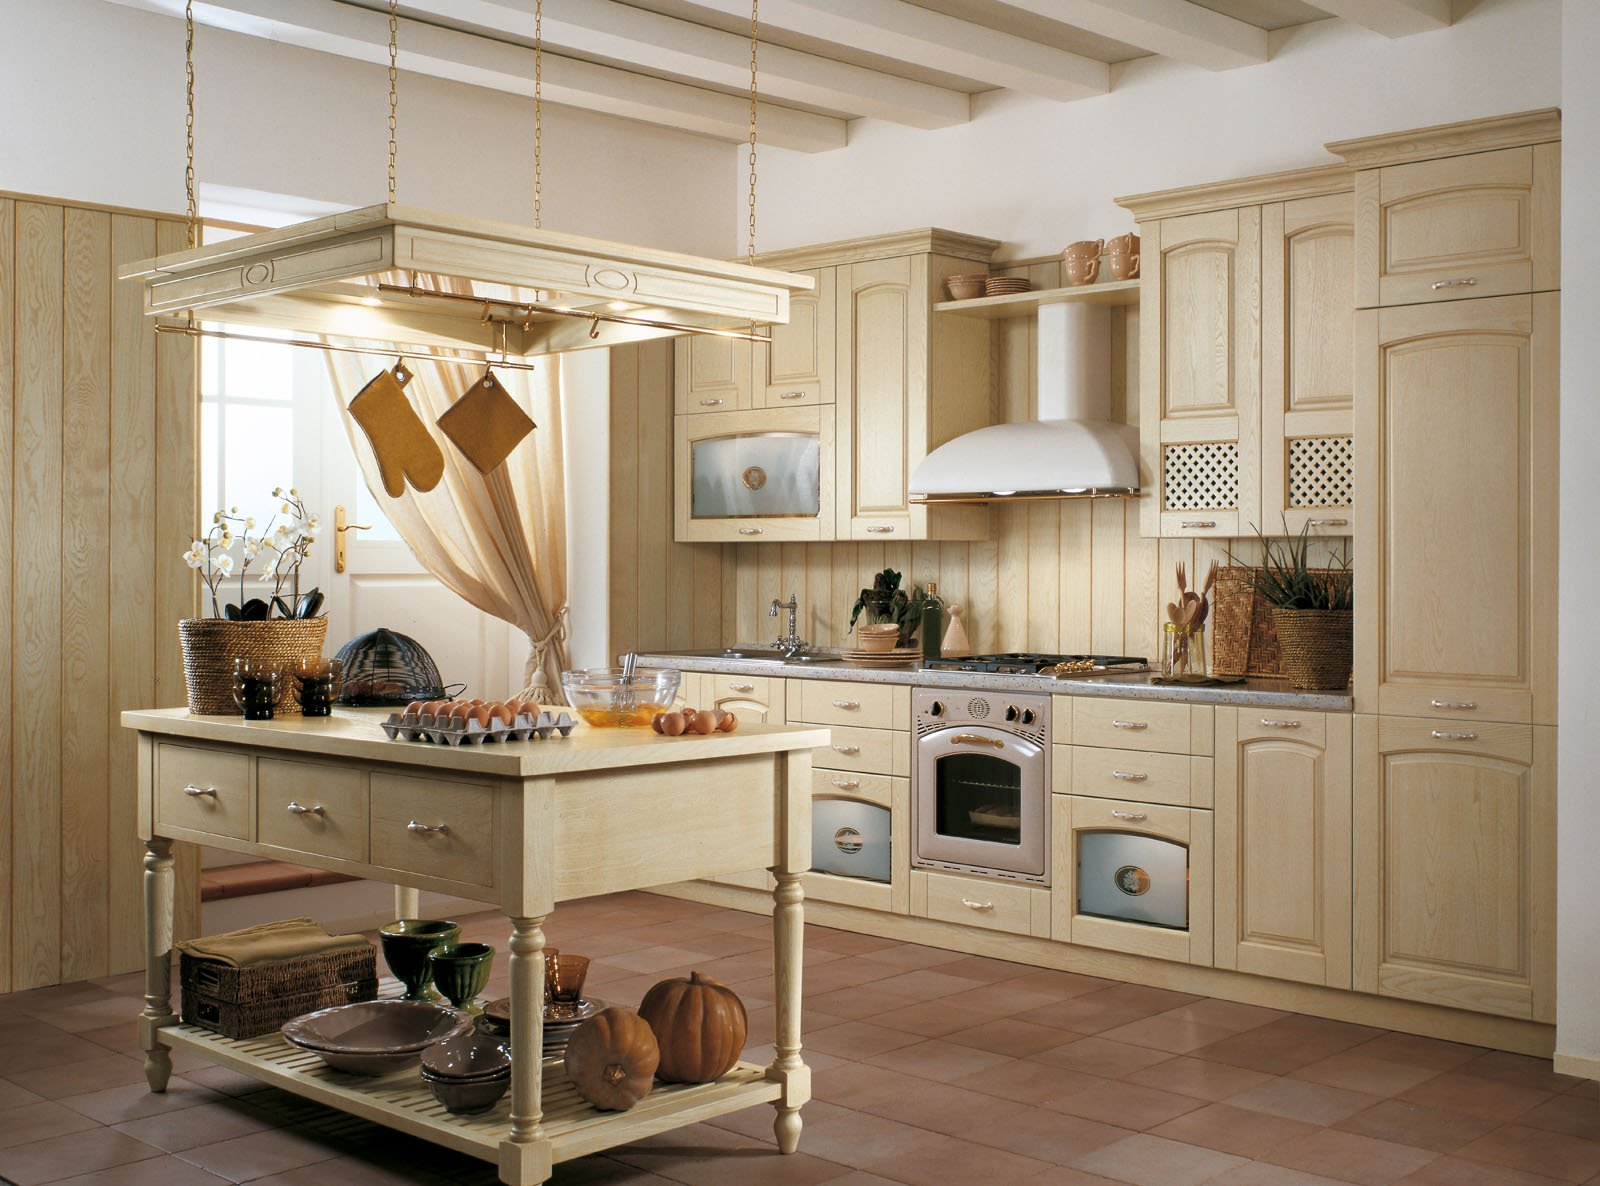 Pitture Per Cucine Rustiche. Alice Di Arrex Le Cucine Nella ...